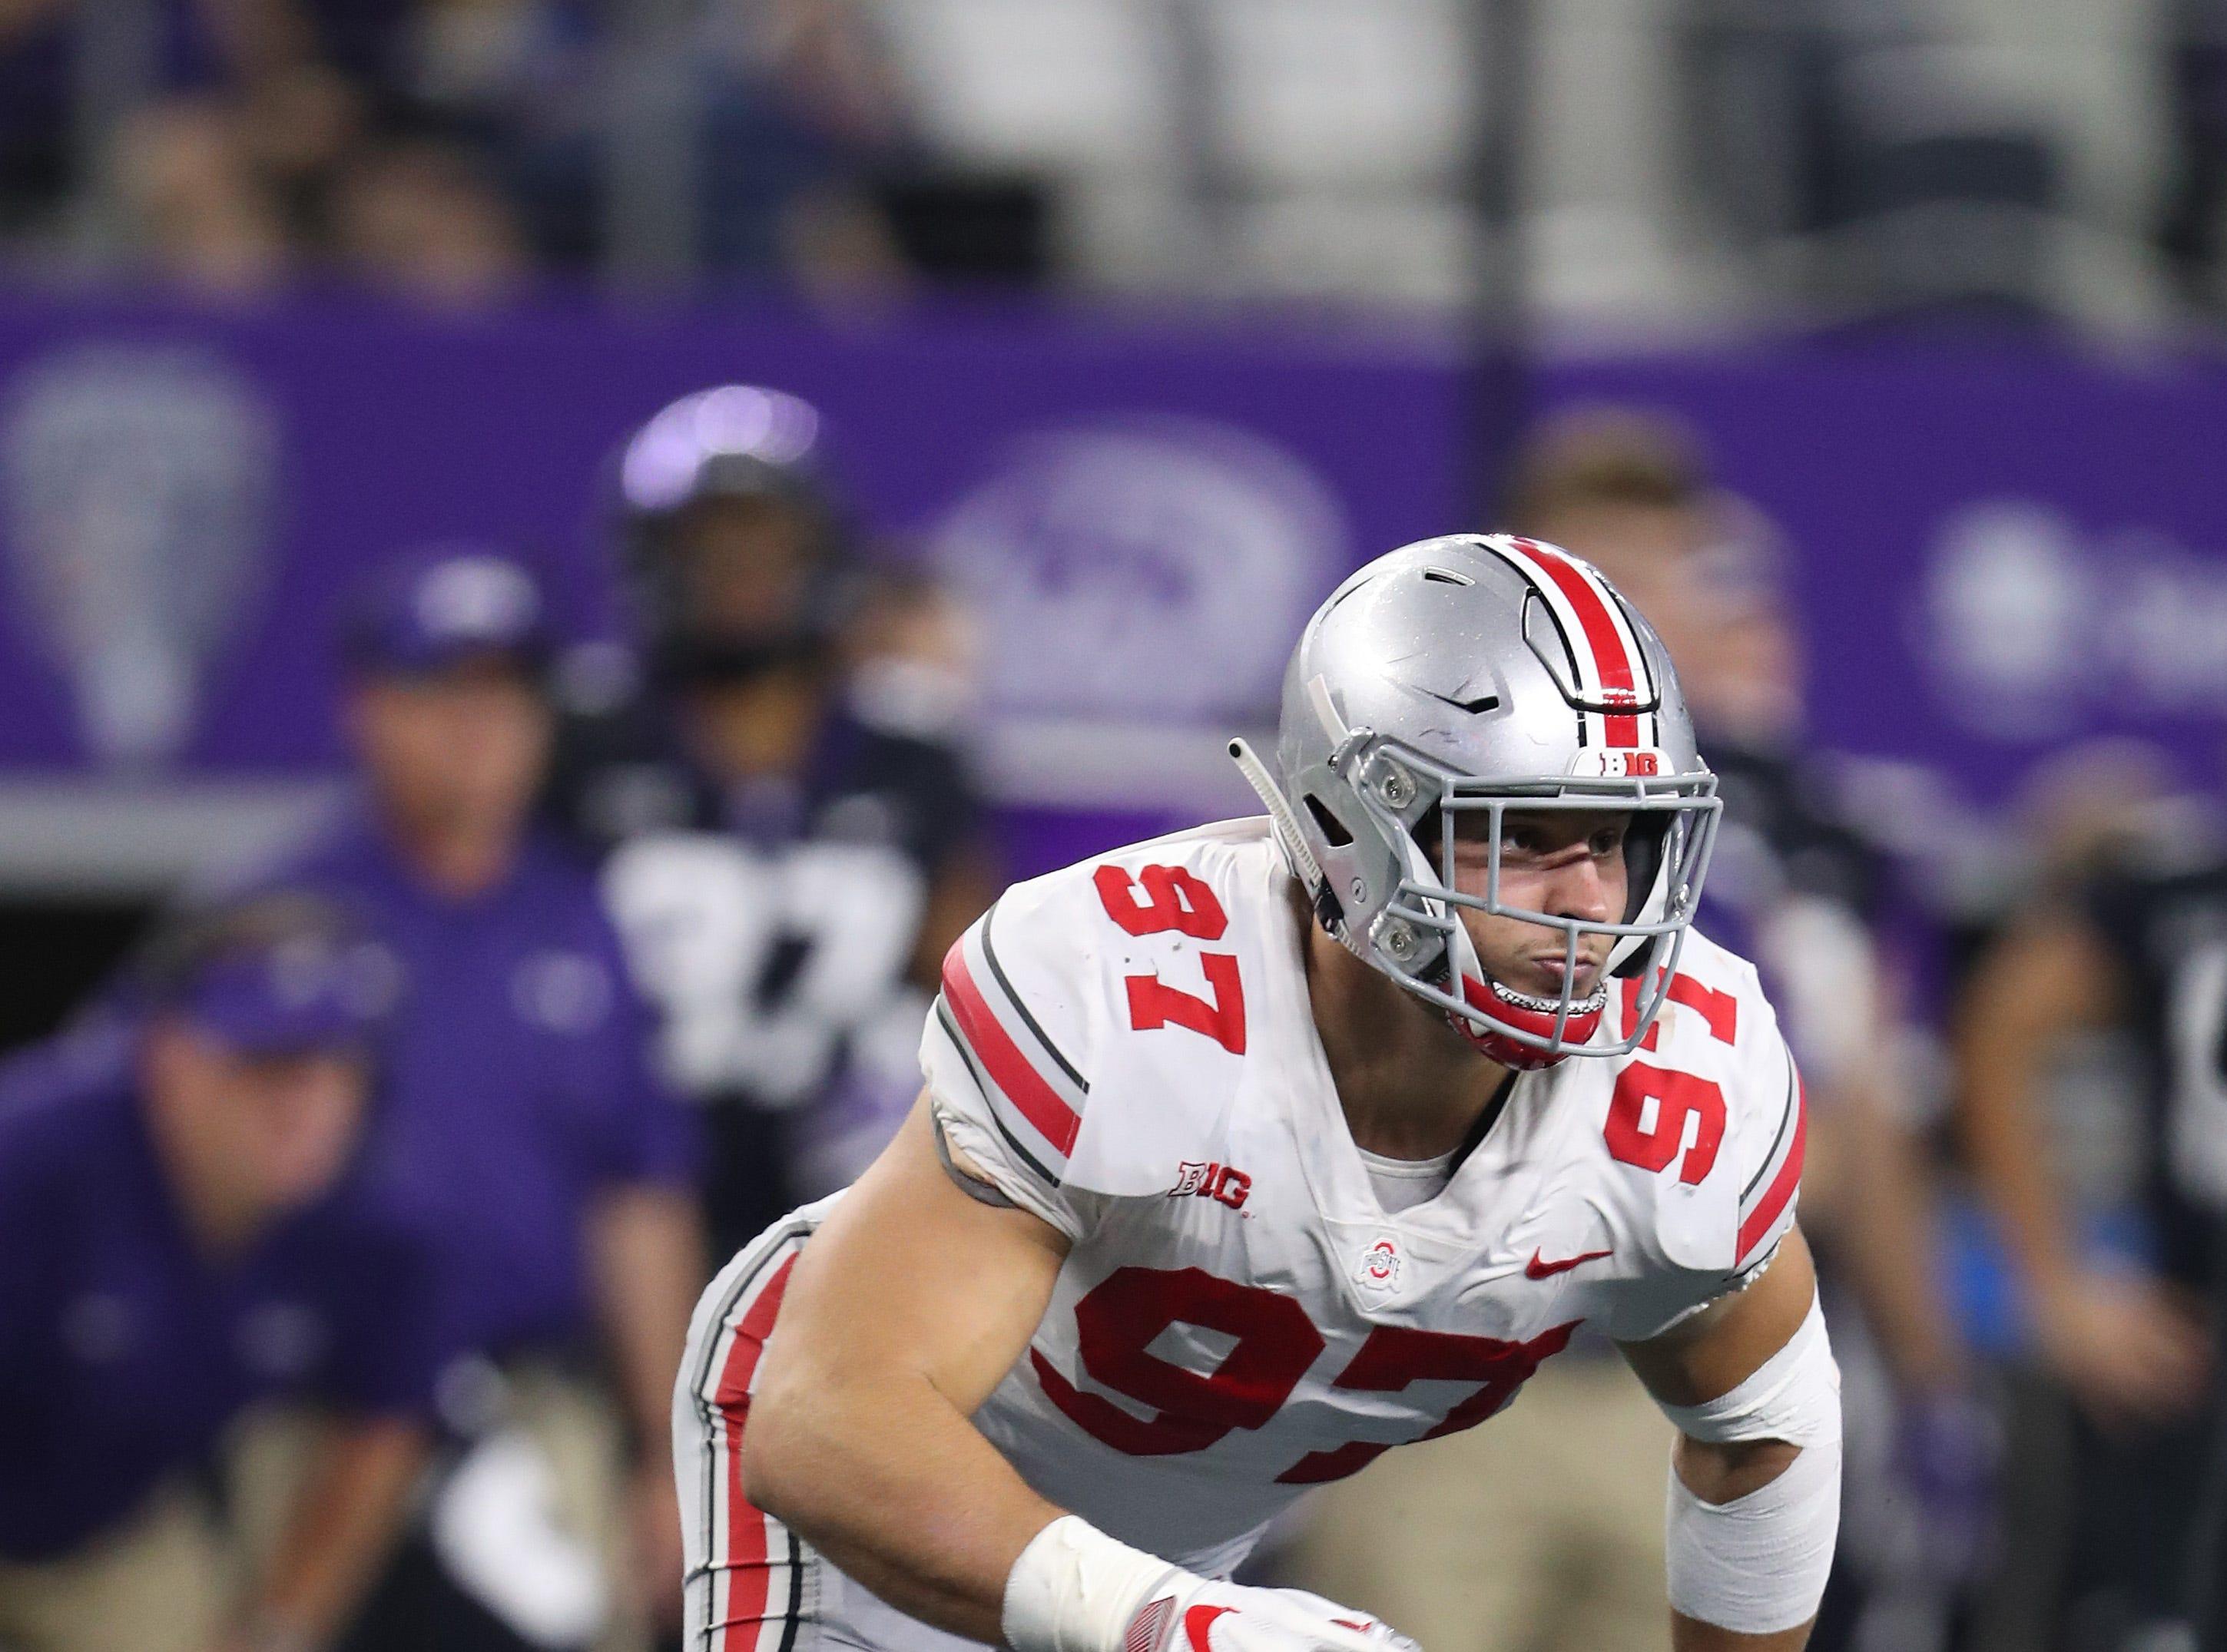 2. 49ers - Nick Bosa, DE, Ohio State